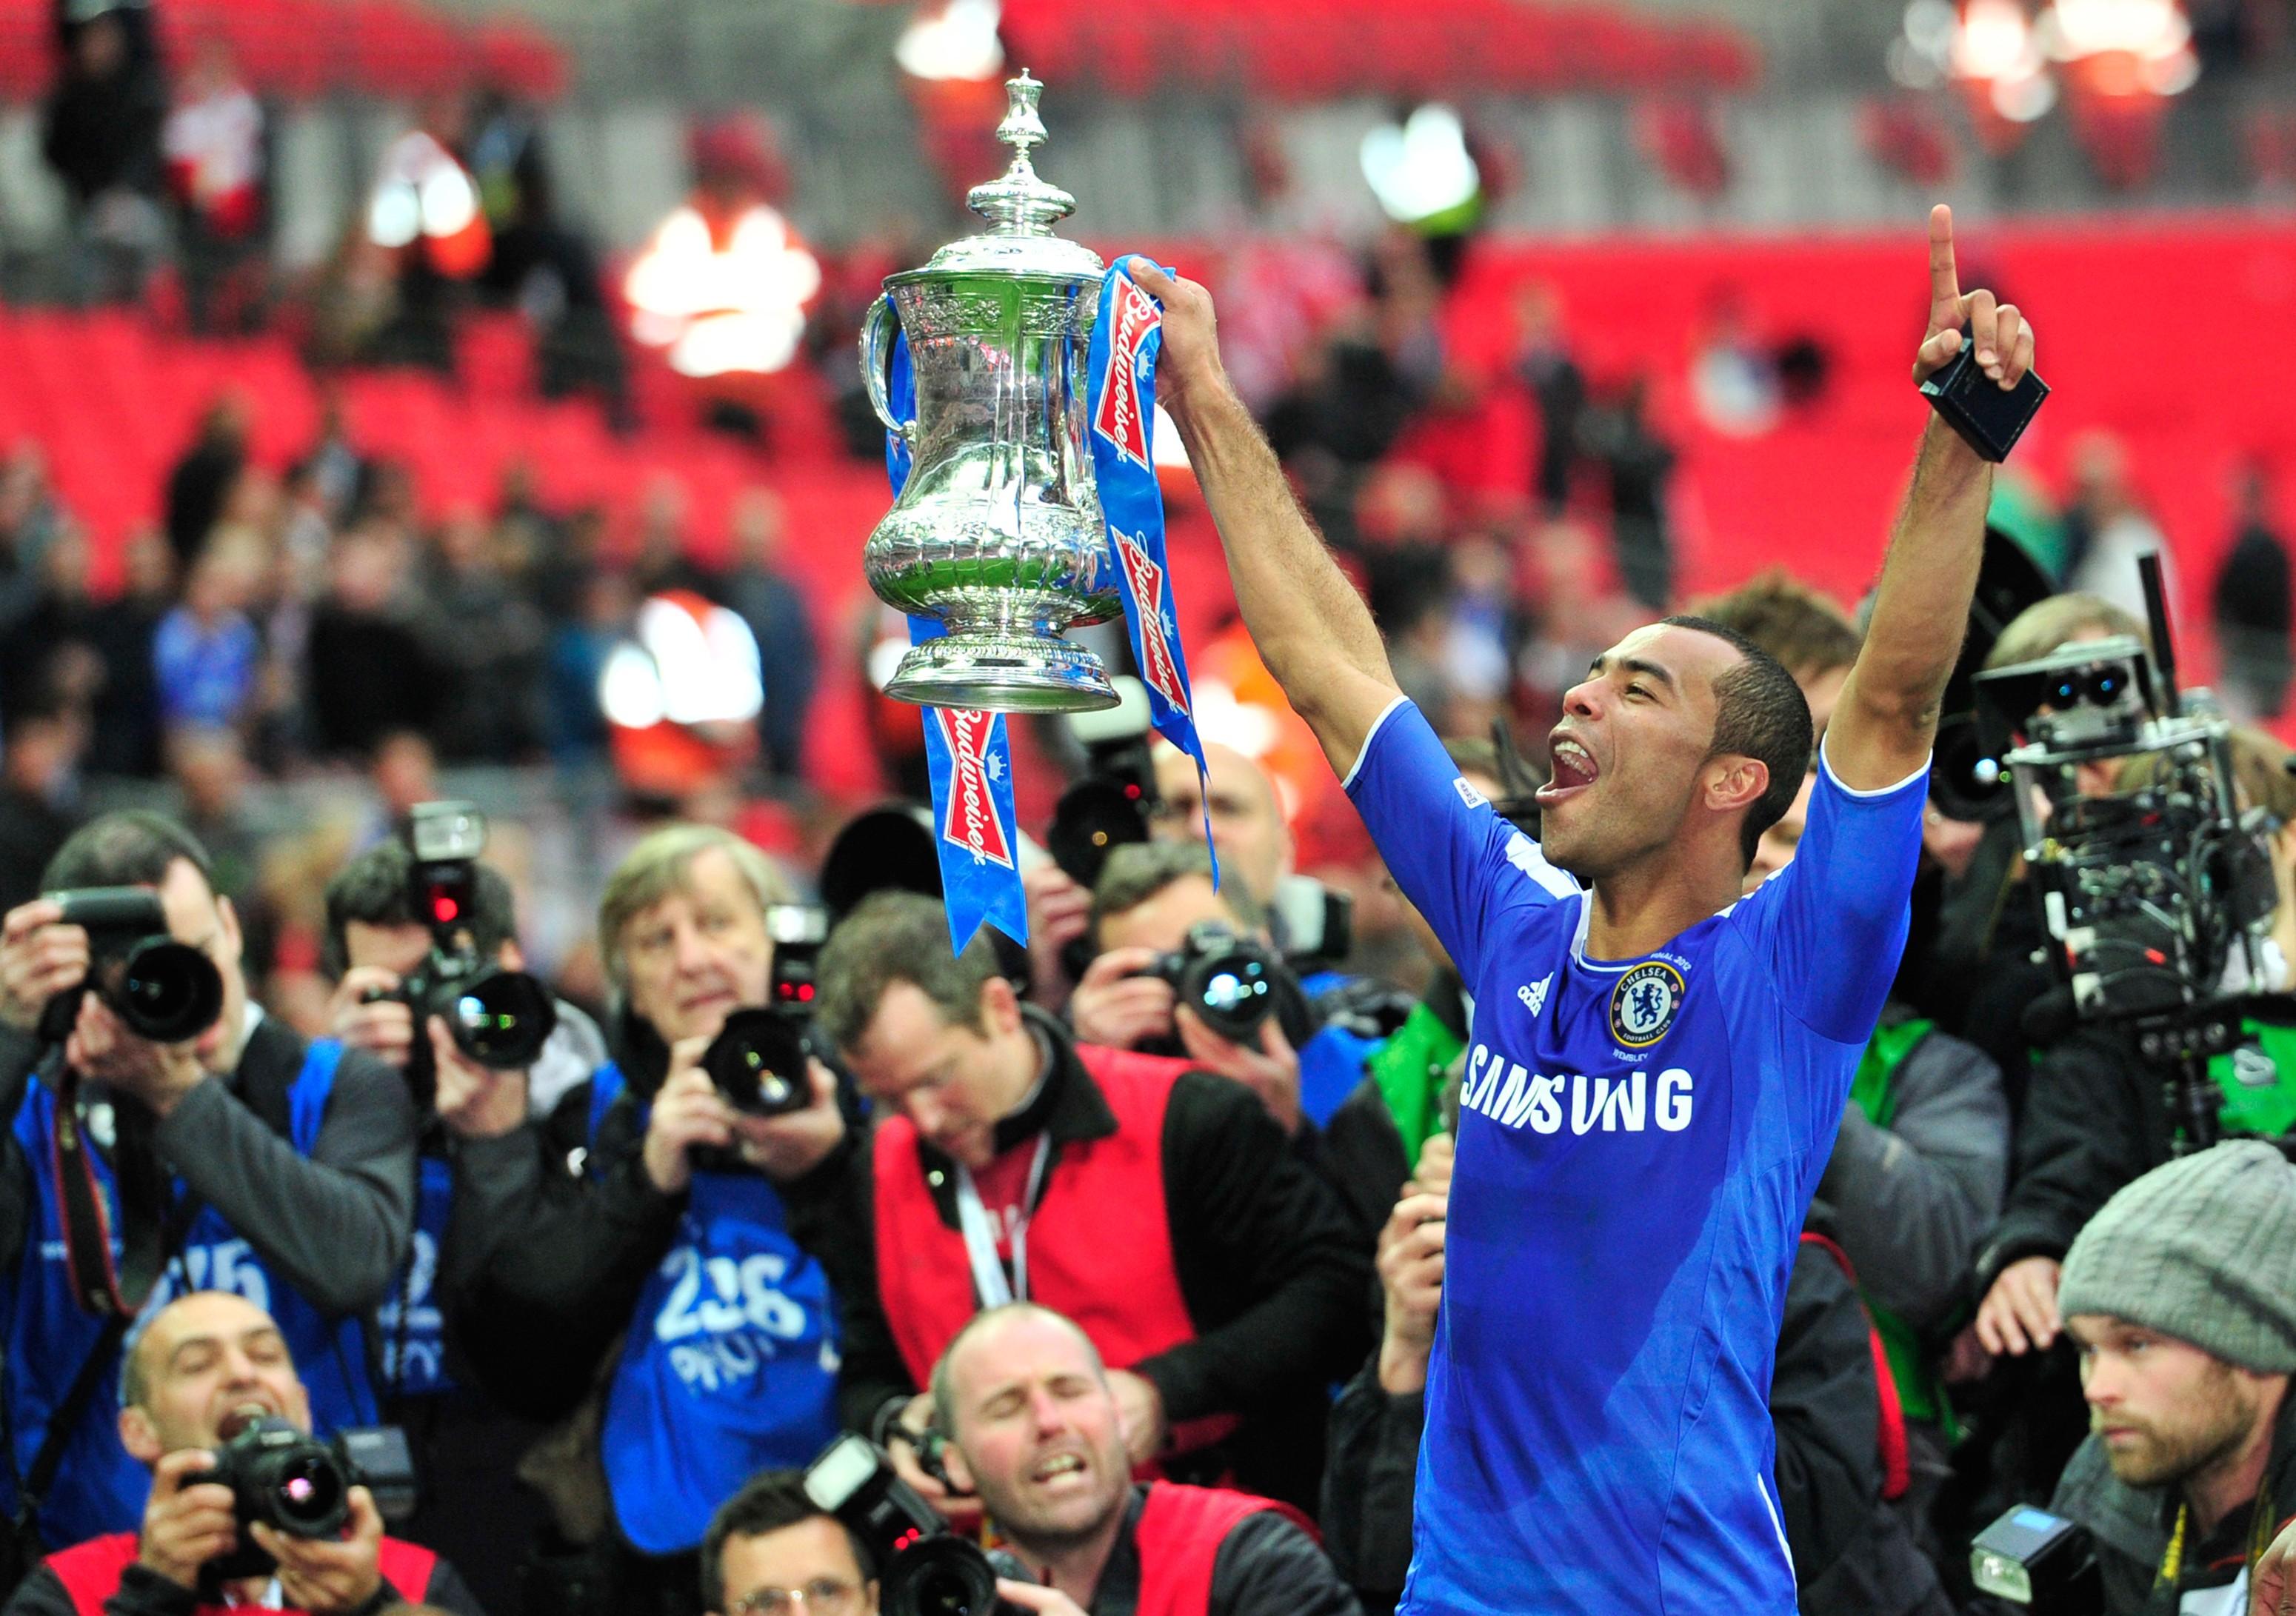 Chelseas-English-defender-Ashley-Cole-c-1566132354.jpg